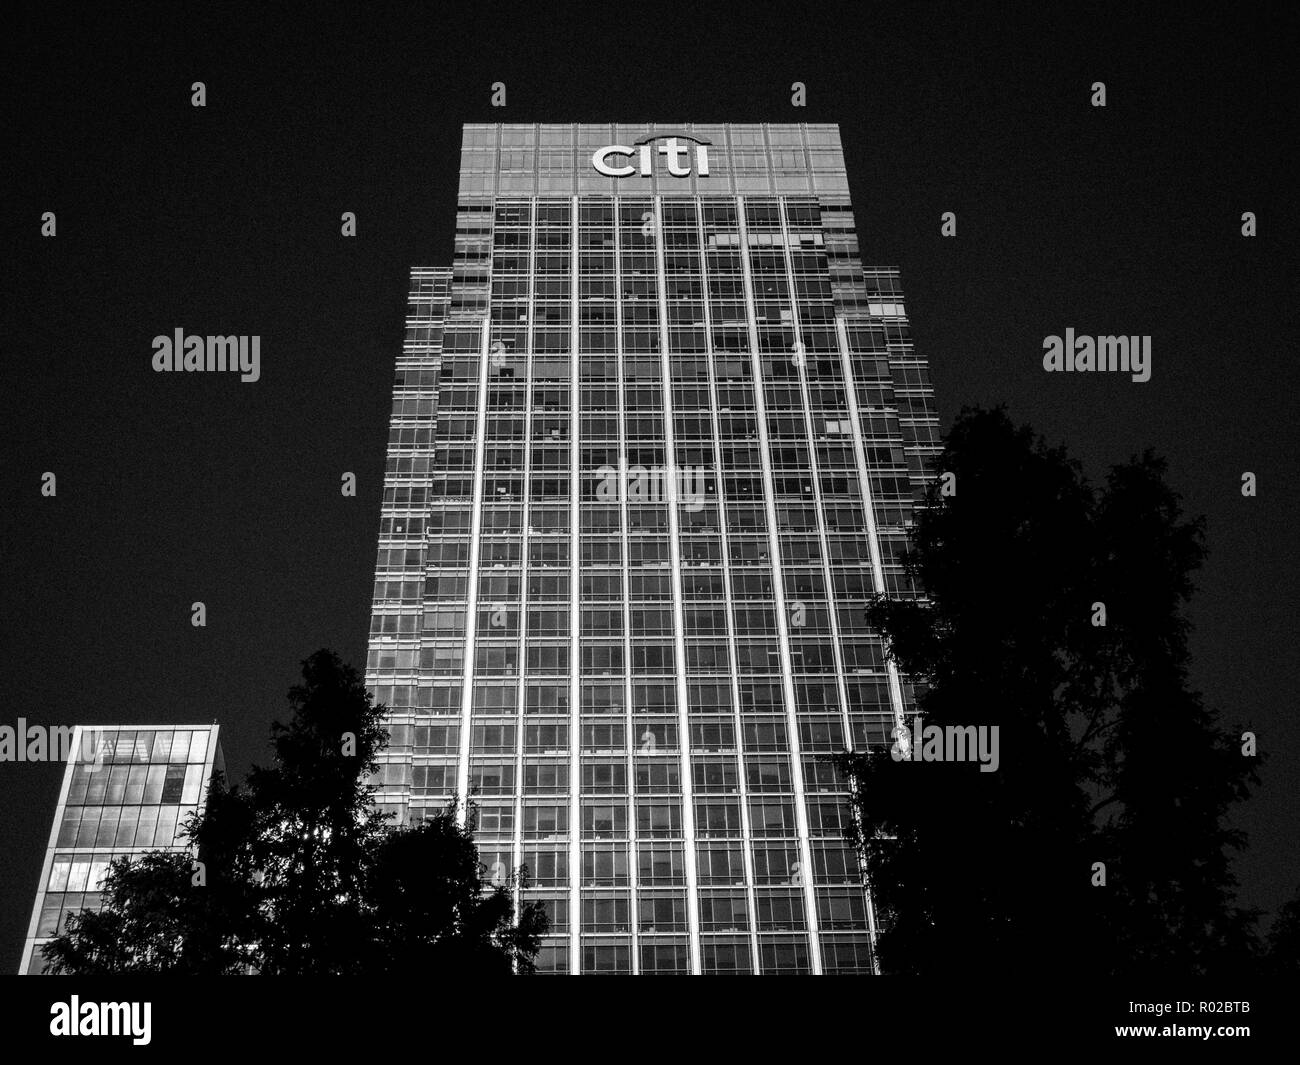 Citibank UK Head office Canary Wharf,  Docklands, London, England, UK, GB. - Stock Image